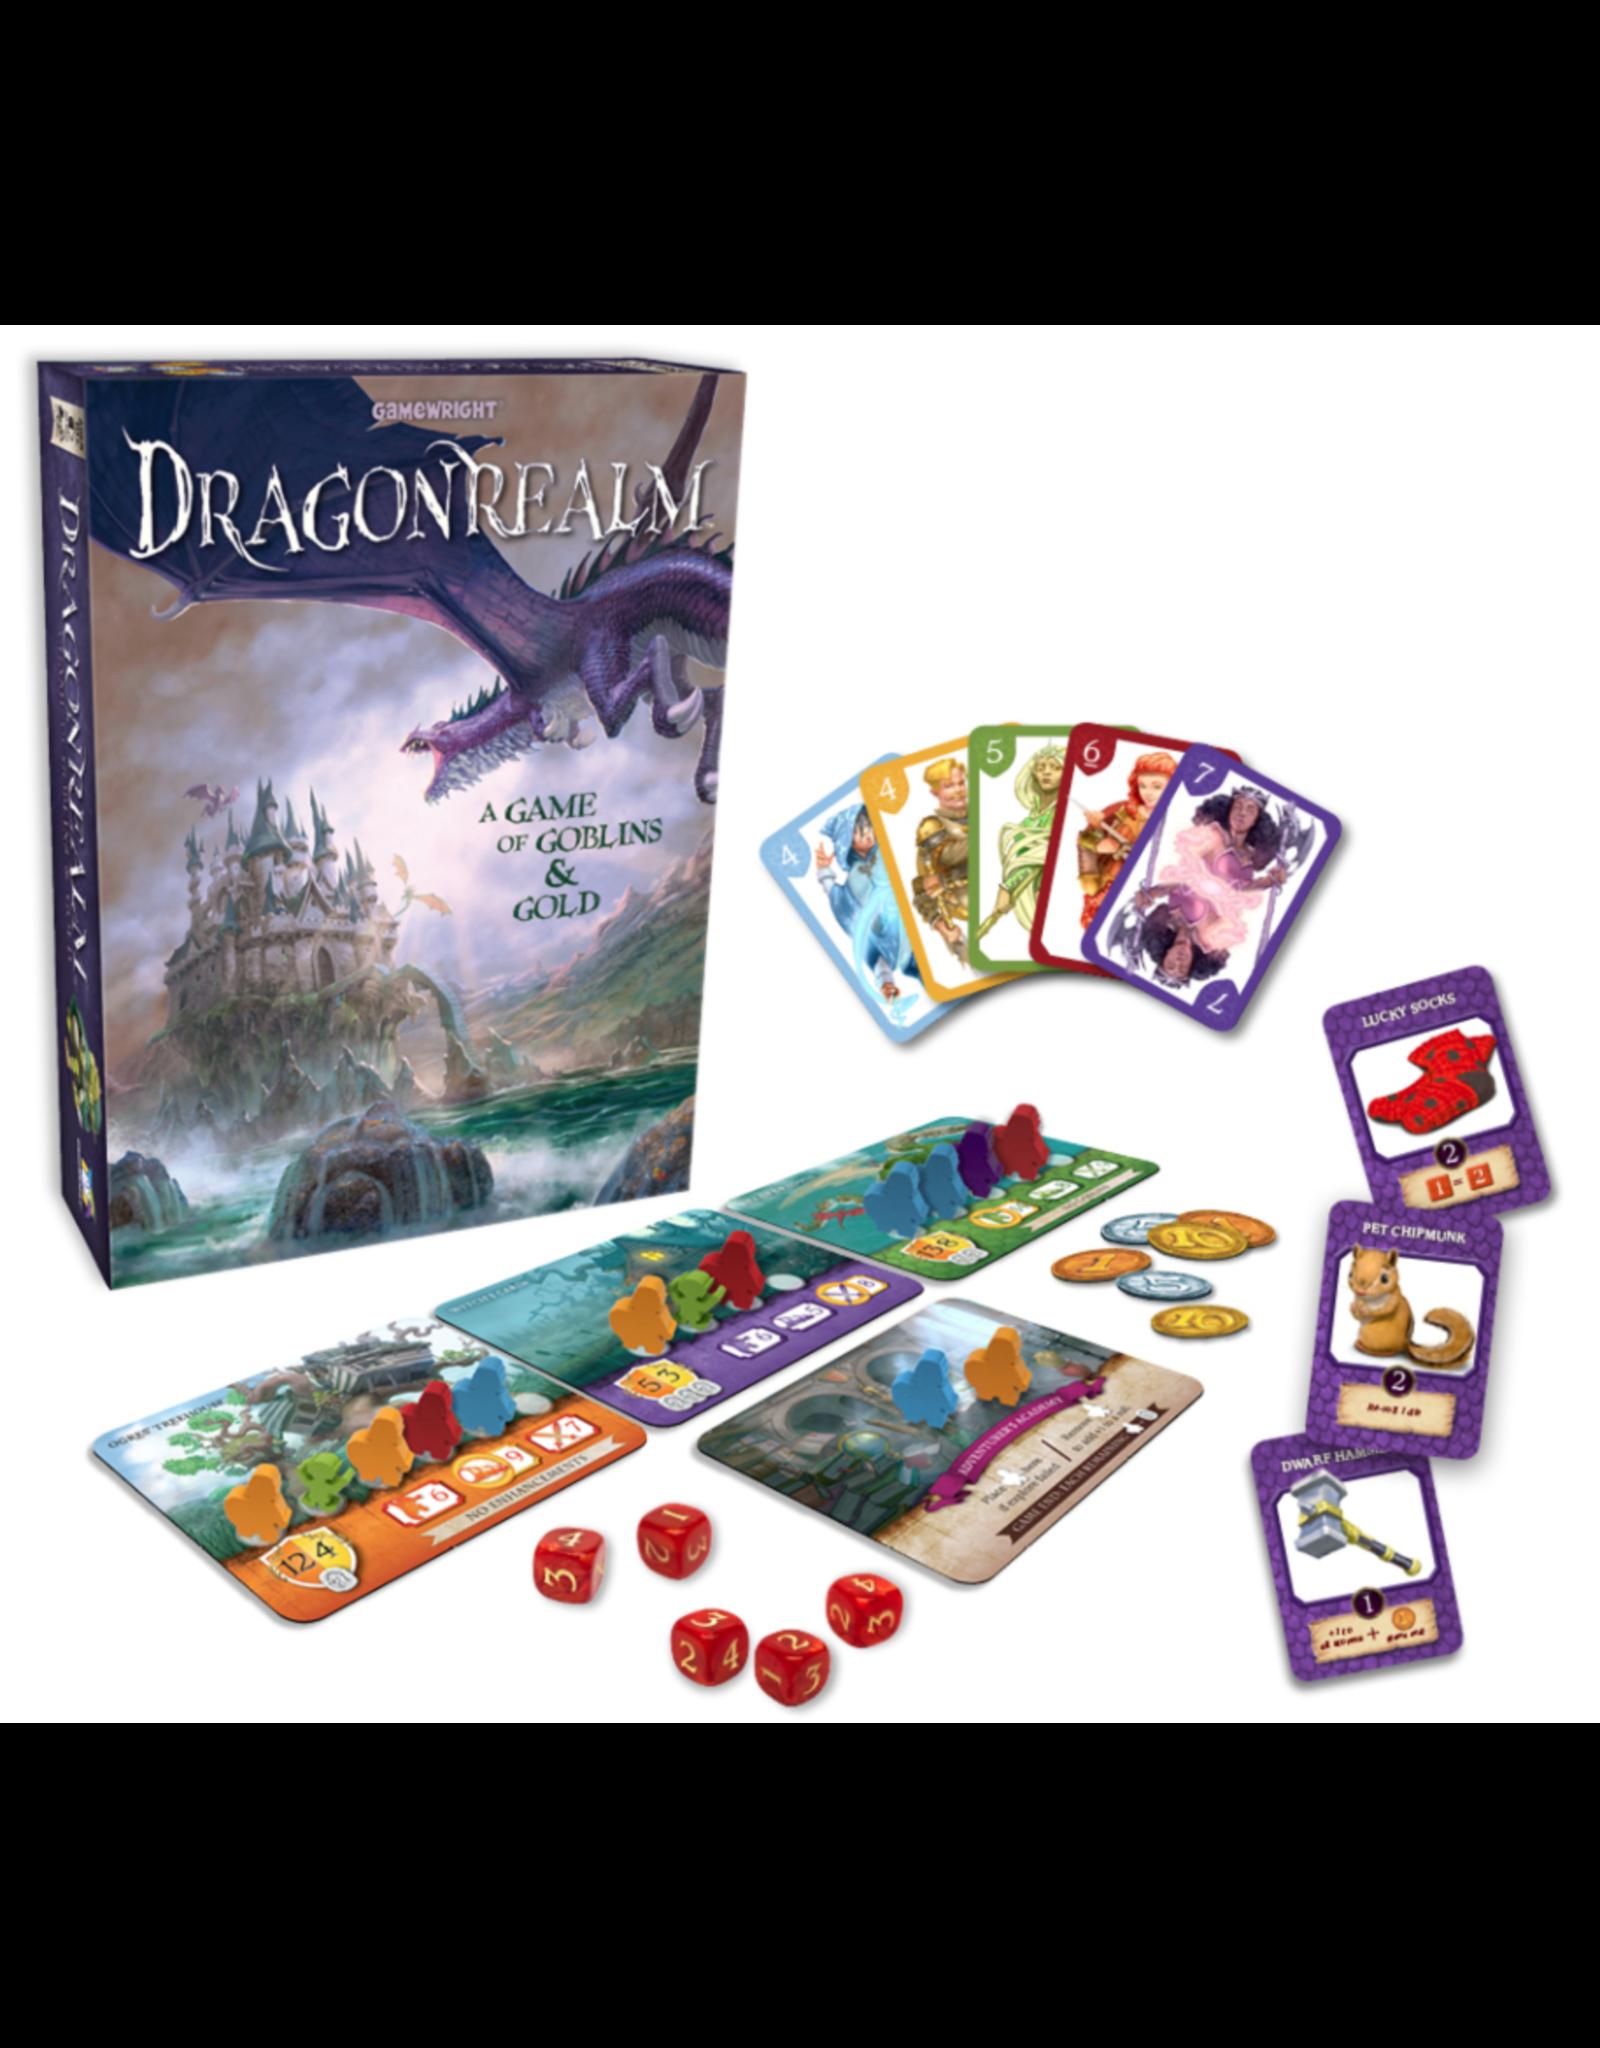 Gamewright Dragonrealm Game